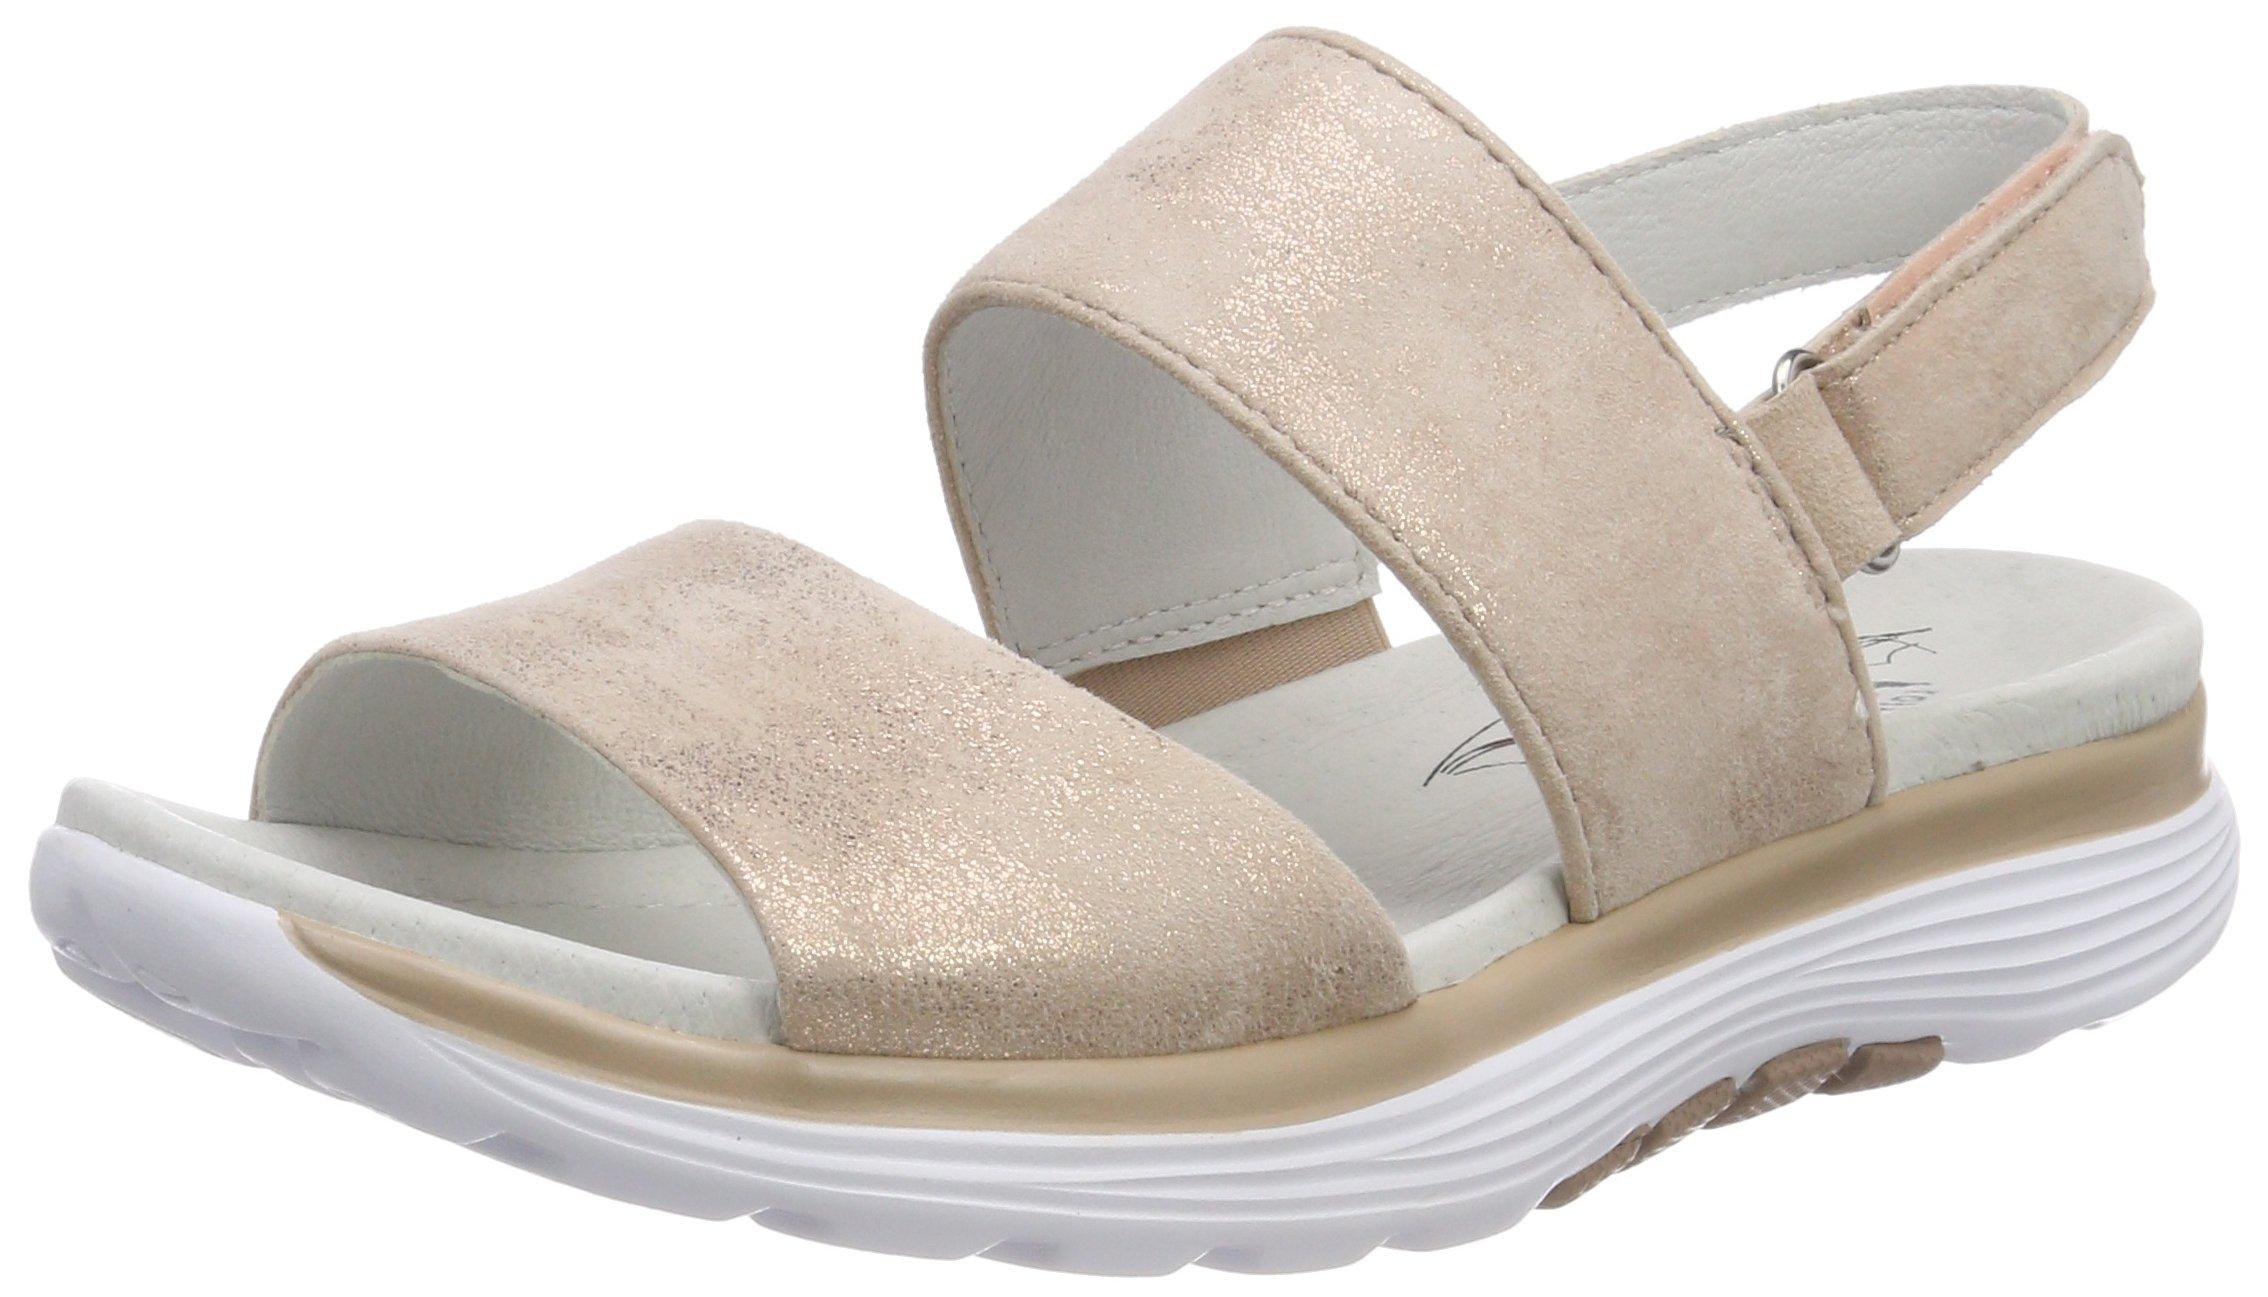 Gabor Cheville Shoes FemmeMulticolorerame42 Bride Eu RollingsoftSandales A54jLR3